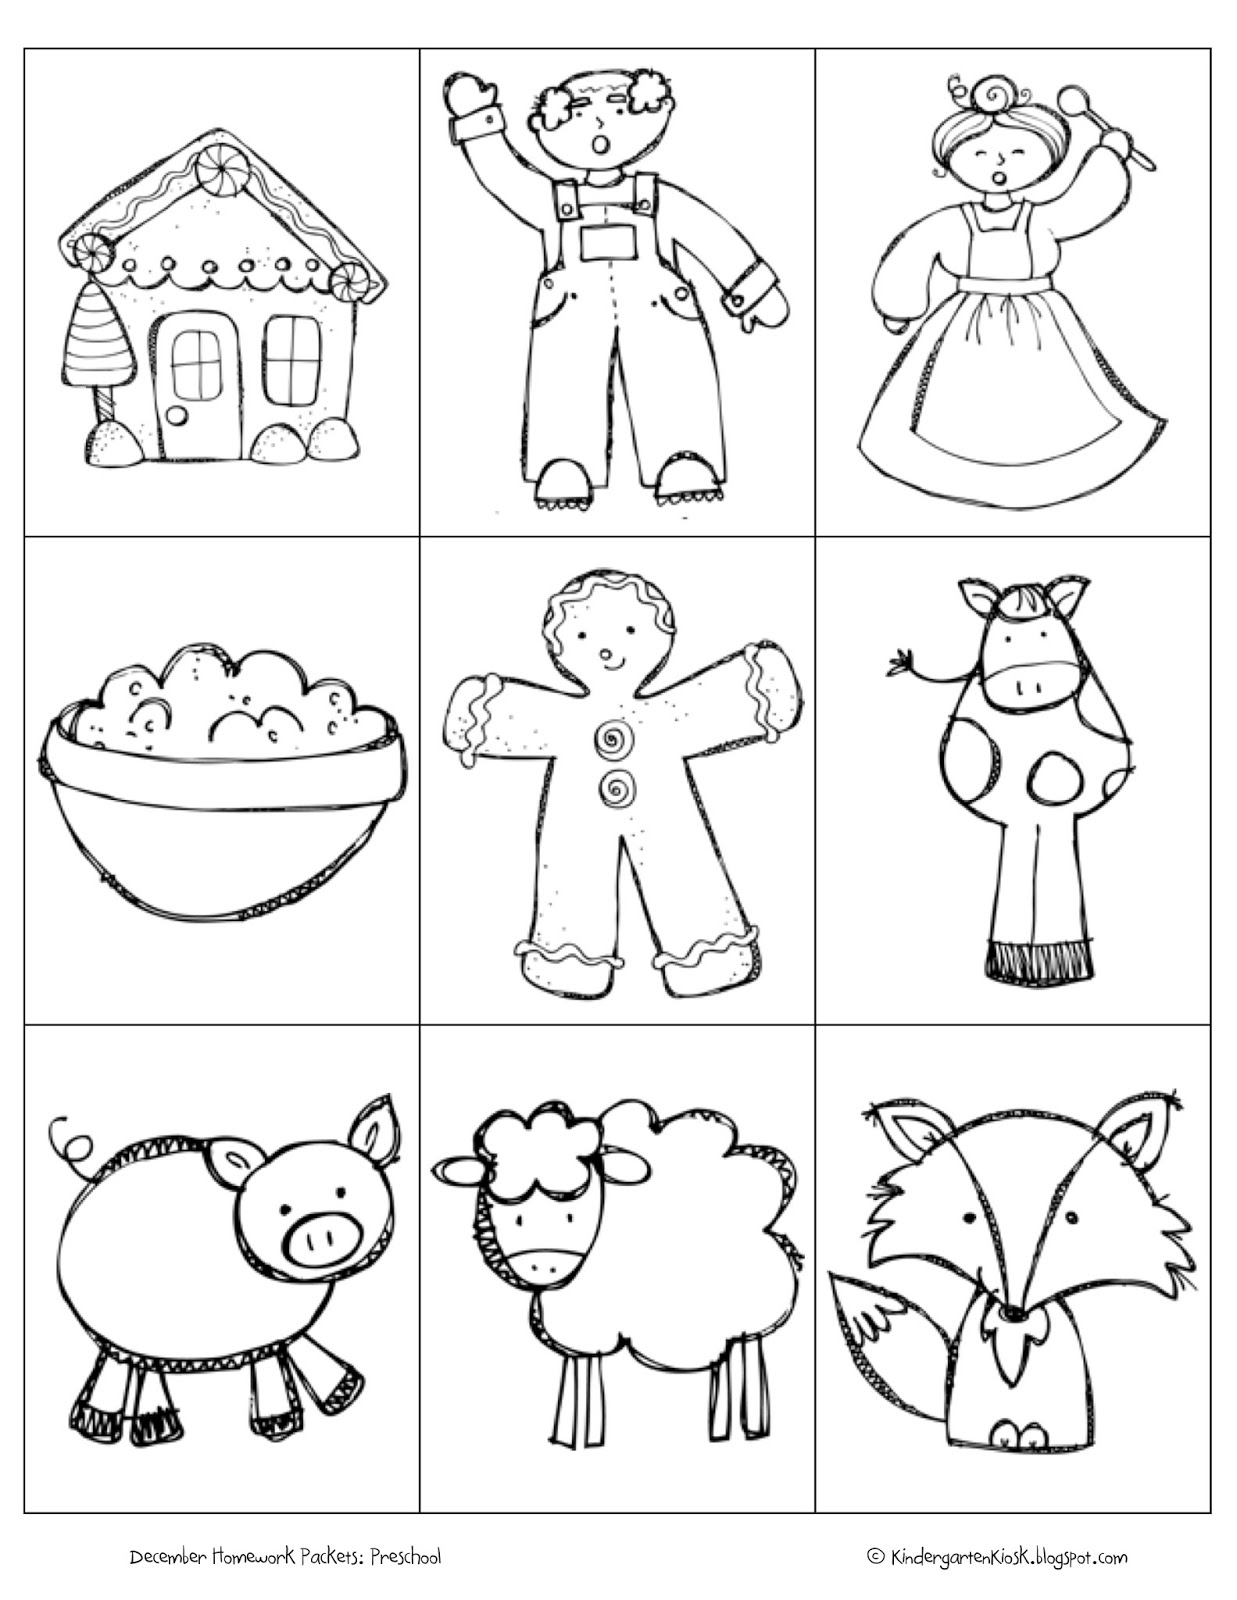 Kindergarten Kiosk Developmentally Appropriate Family